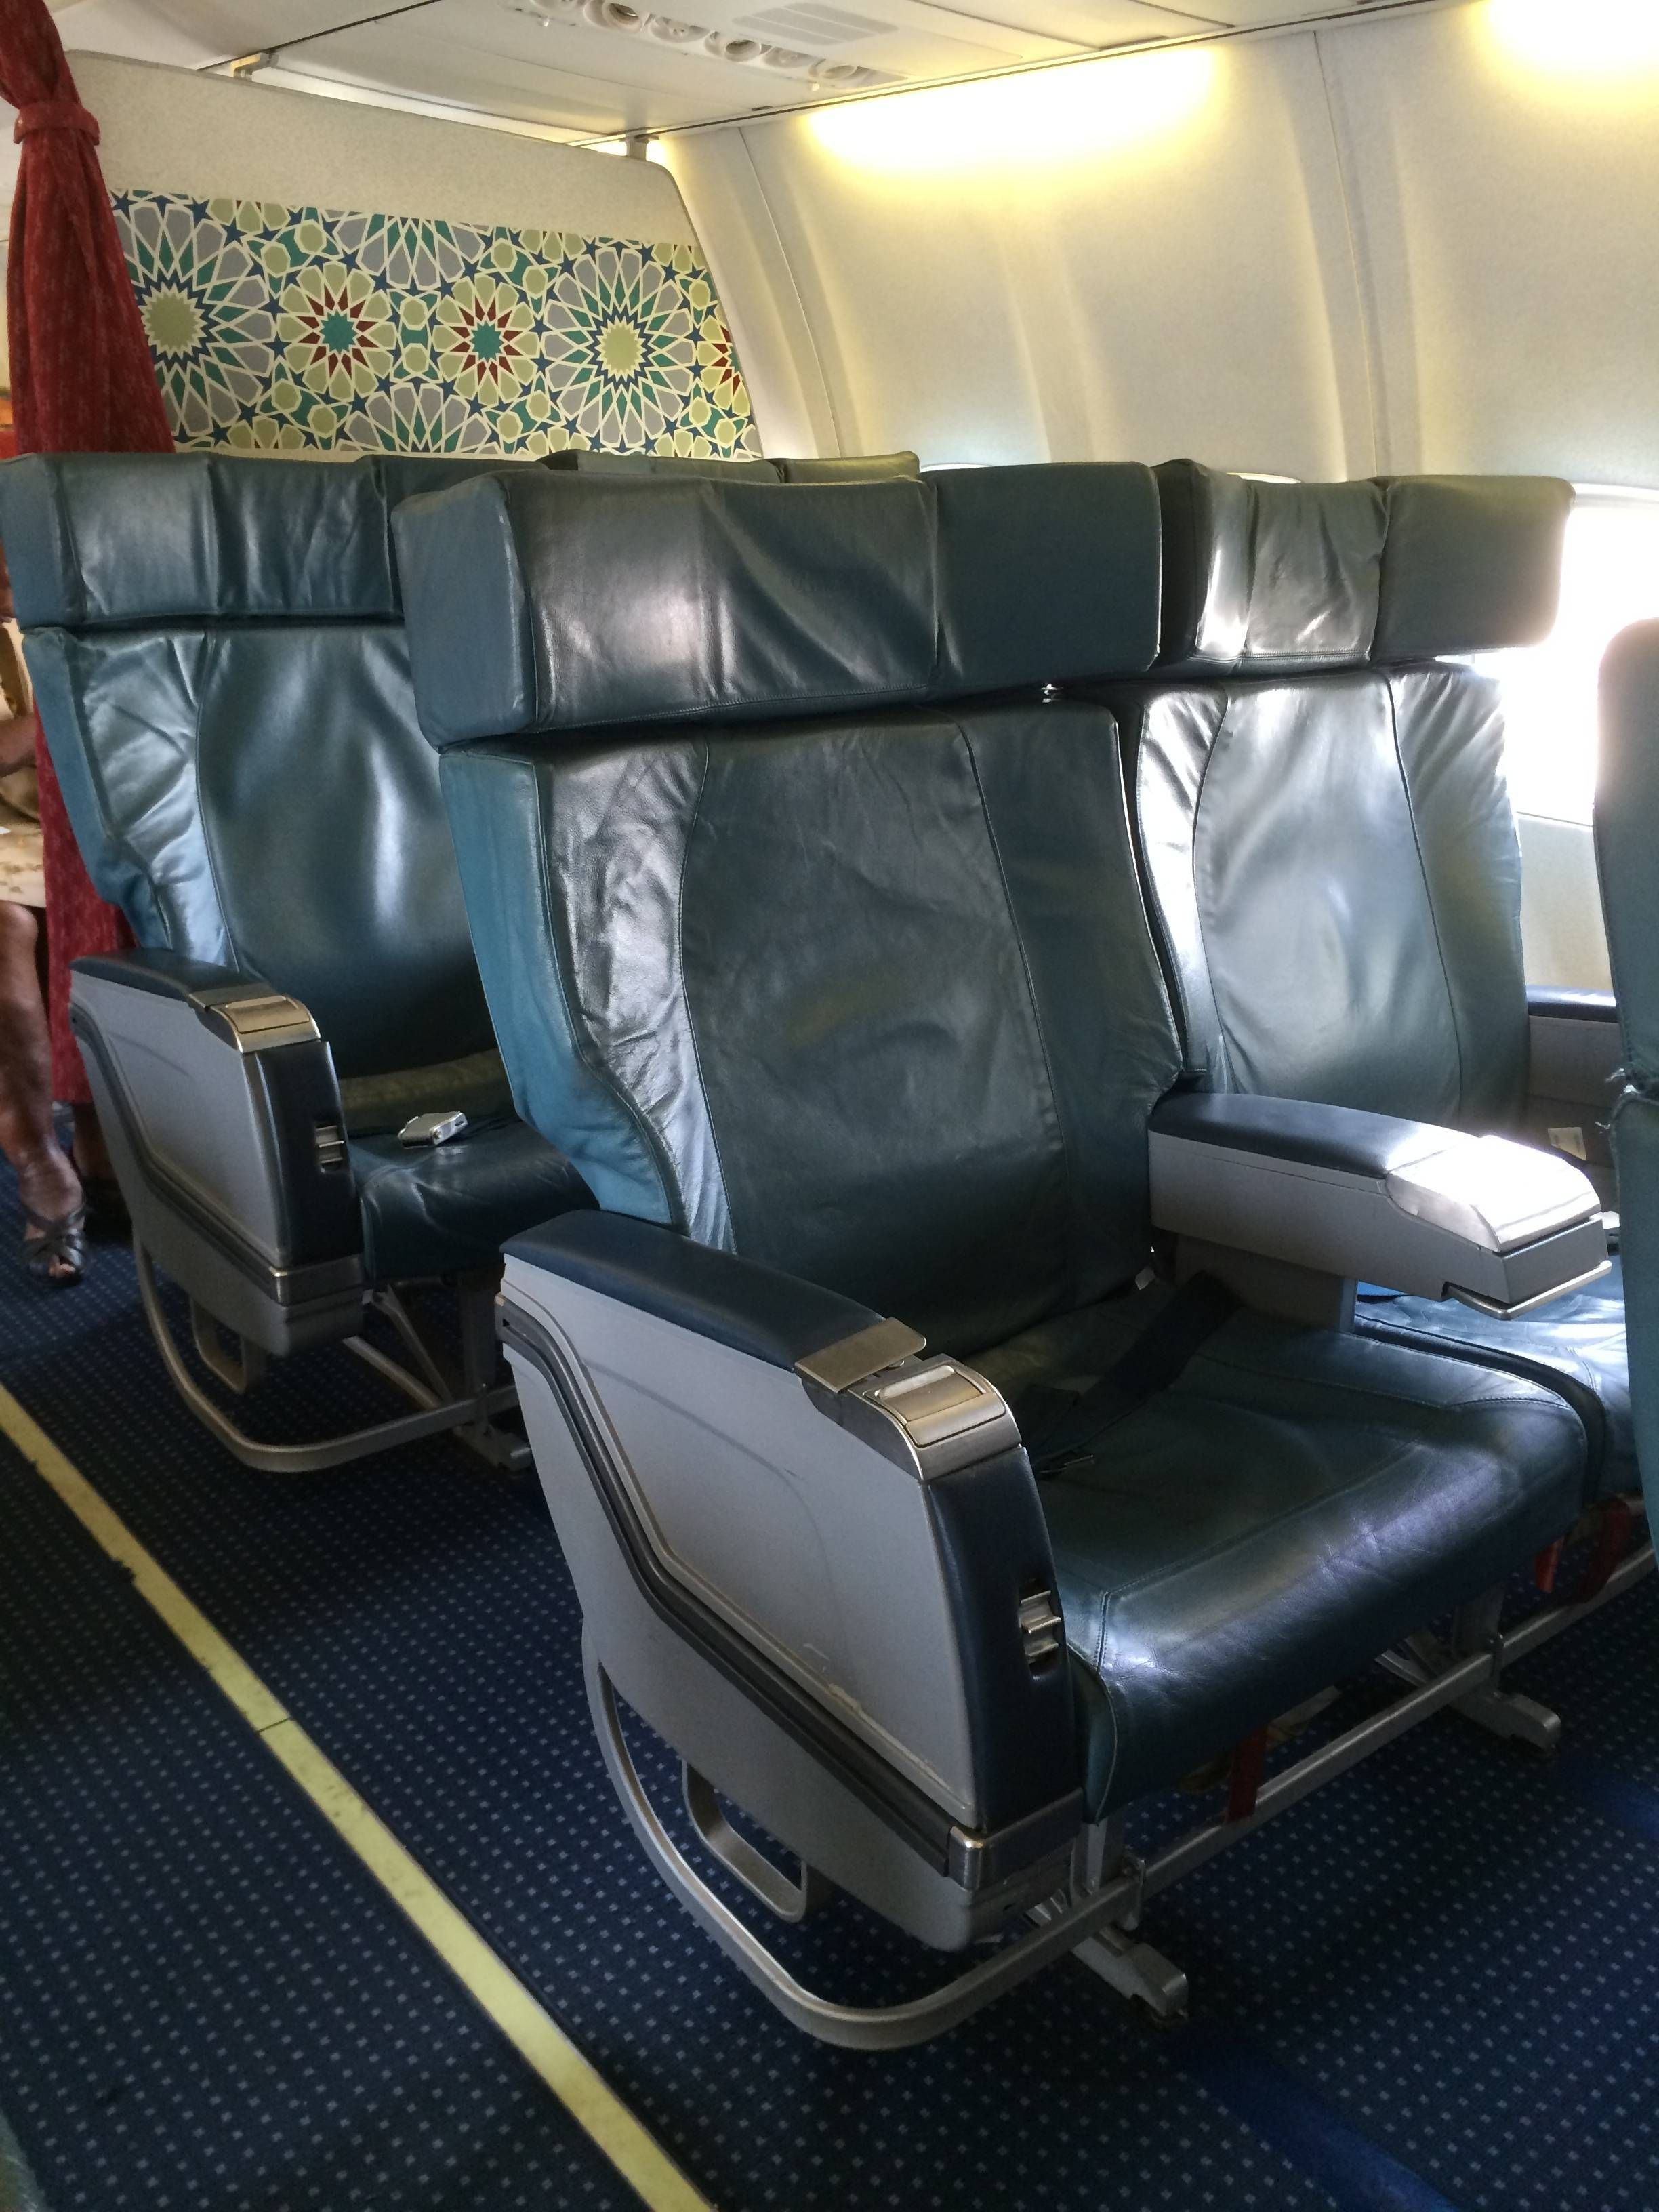 royal air maroc classe executiva b737 business class passageirodeprimeira